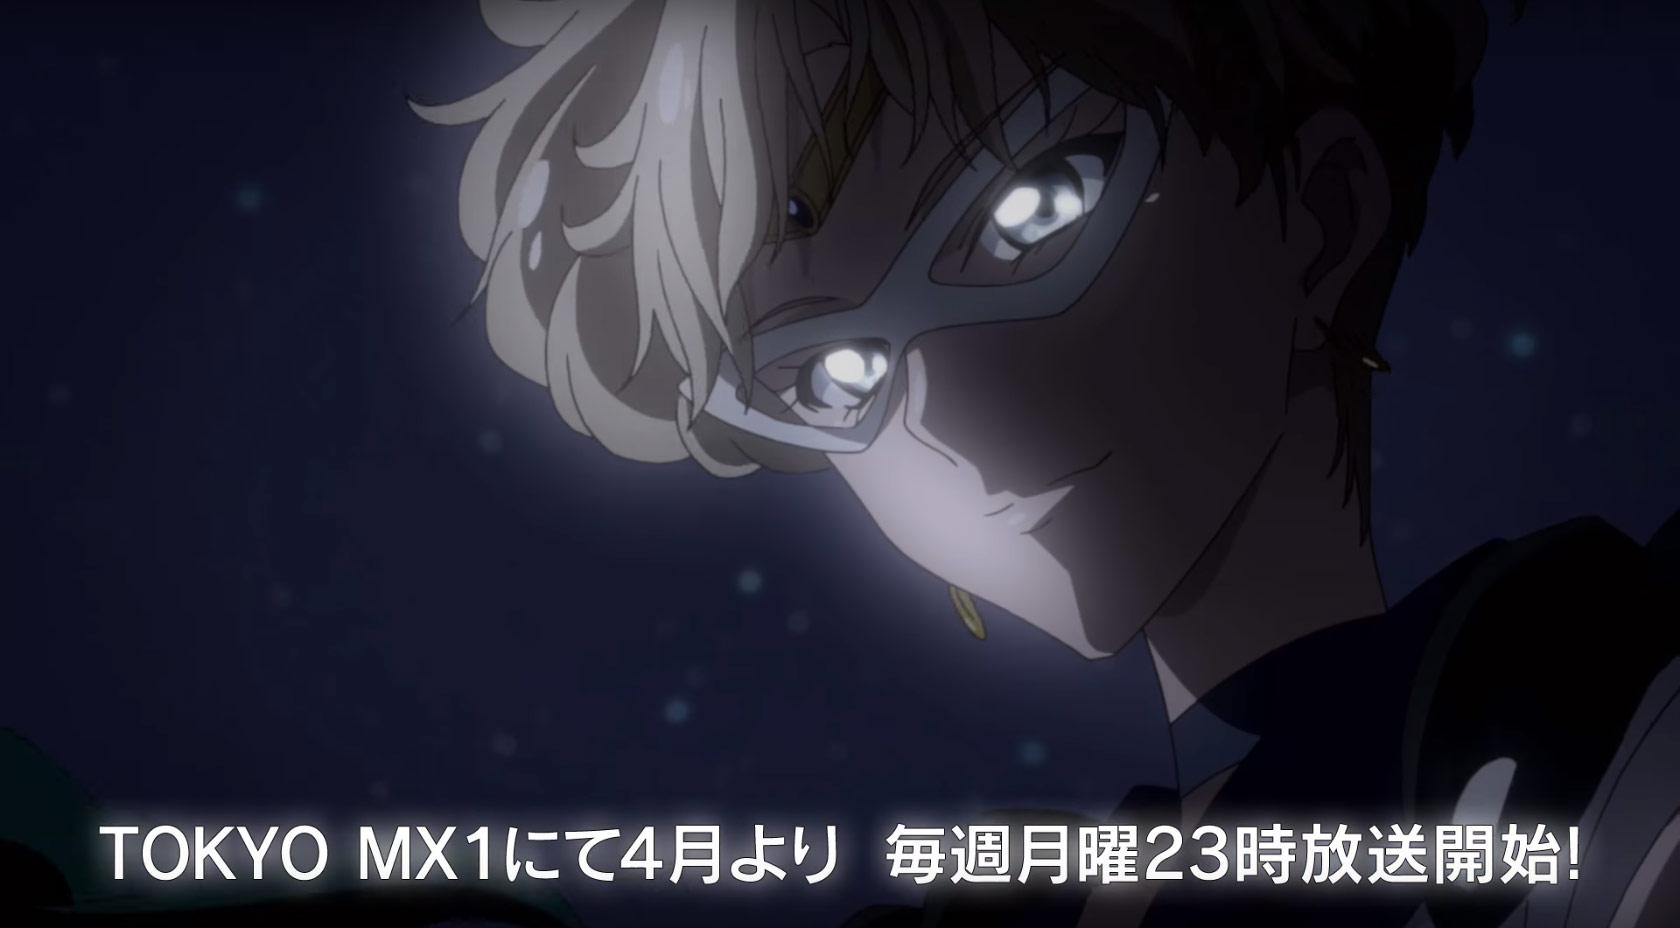 Sailor Uranus wearing mask